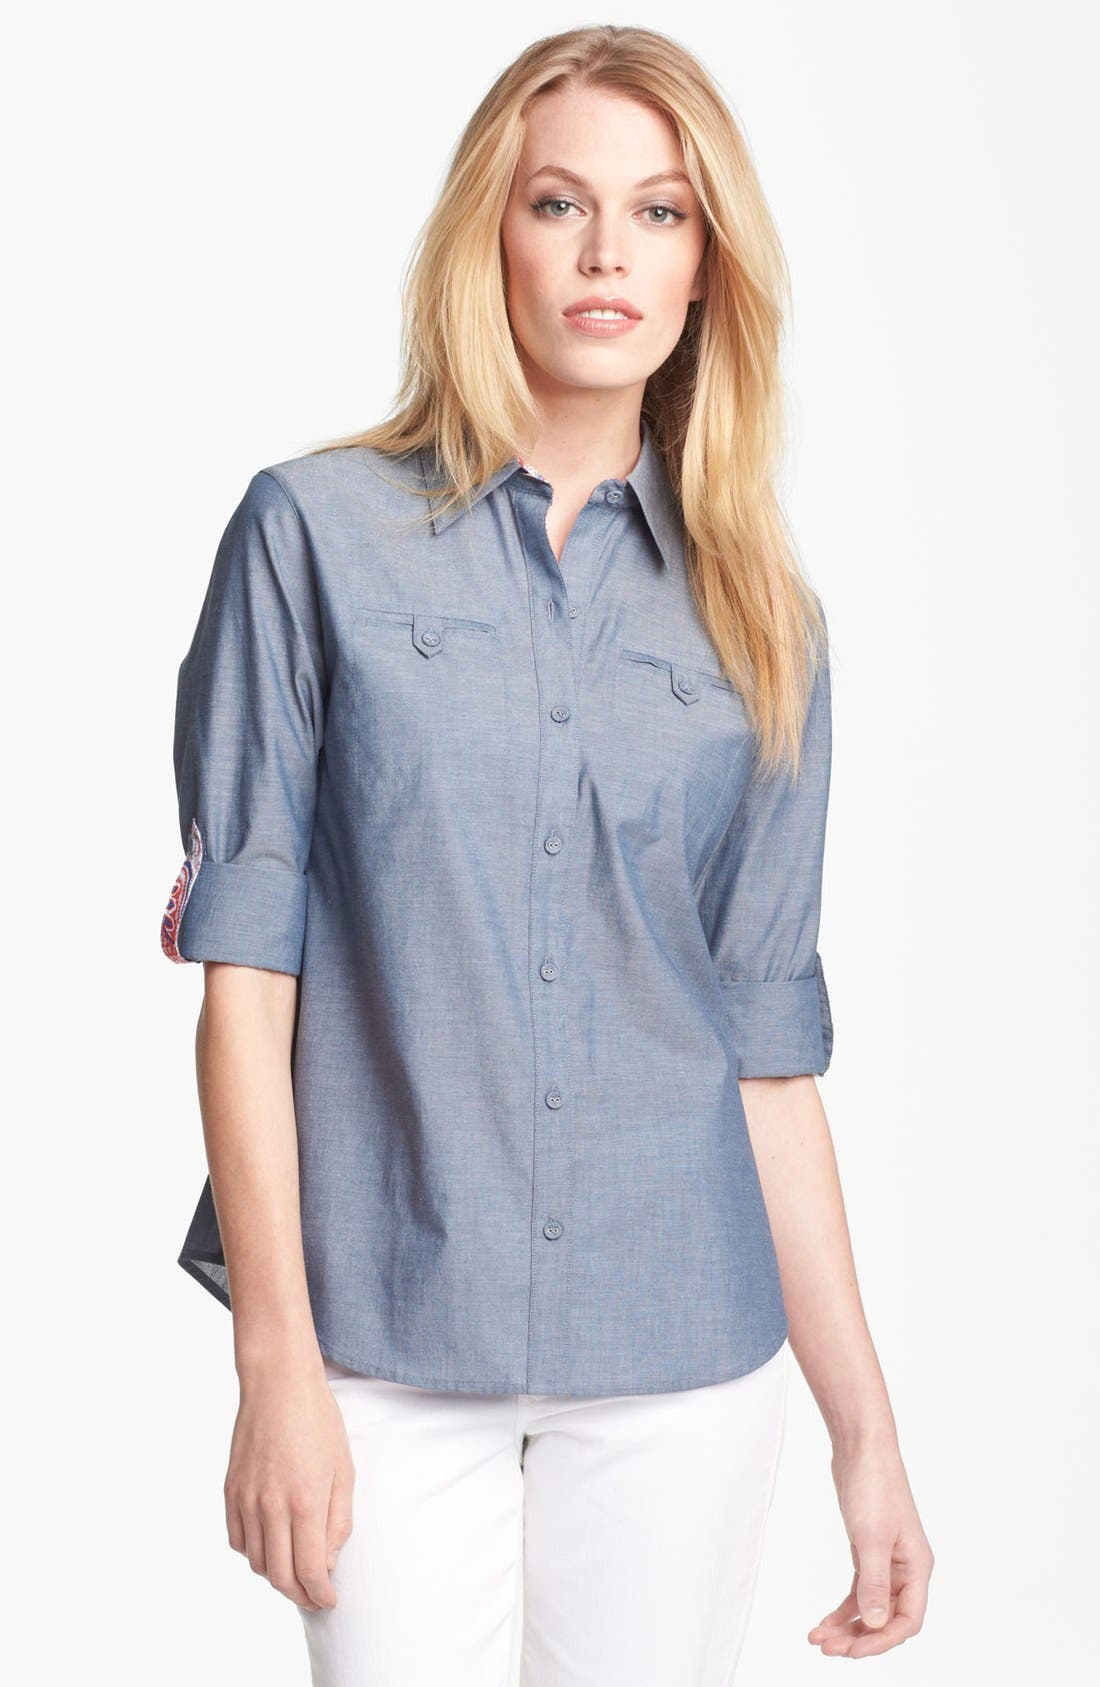 Alternate Image 1 Selected - Foxcroft Chambray Shirt (Petite)